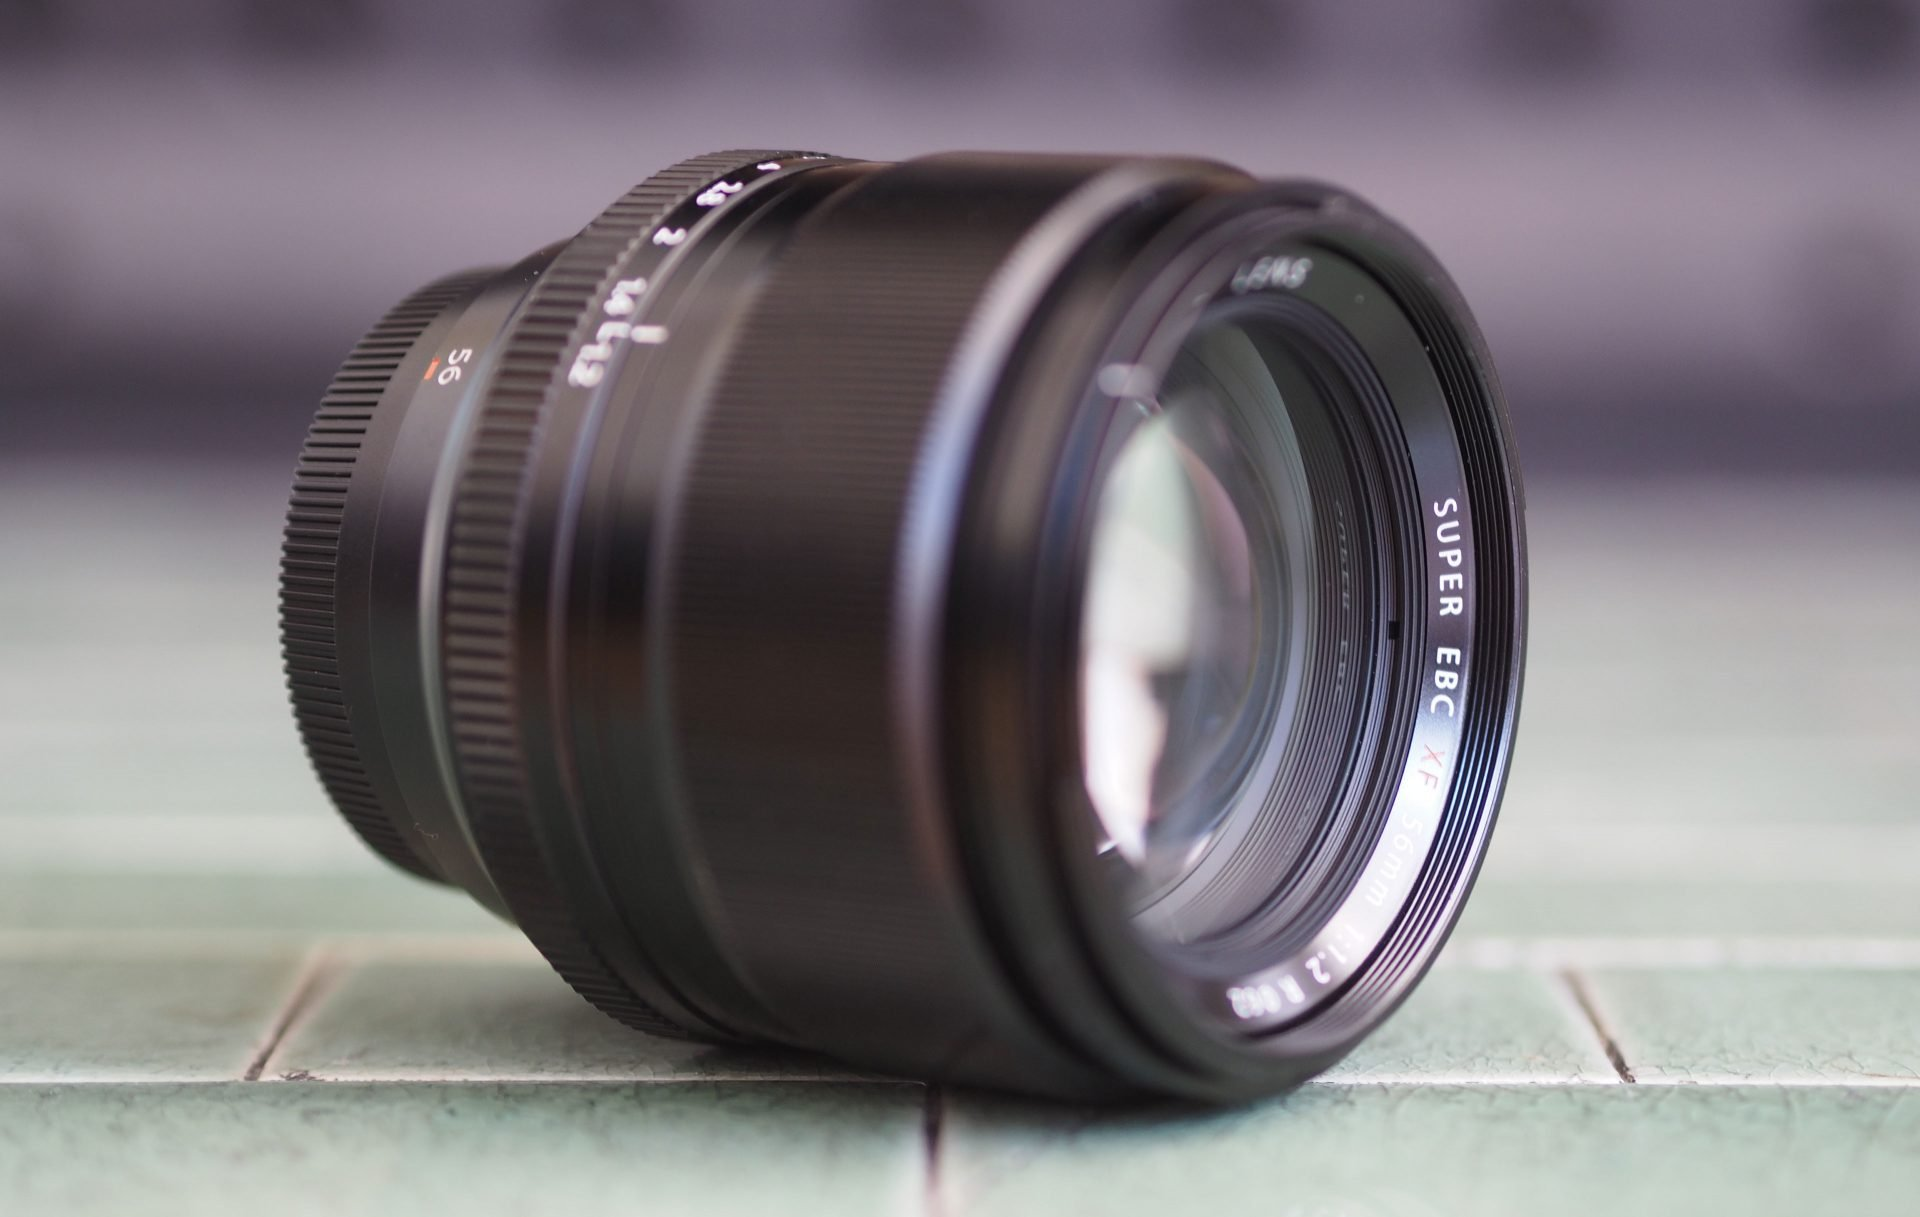 Fujifilm-xf-56mm-f1-2-header-2